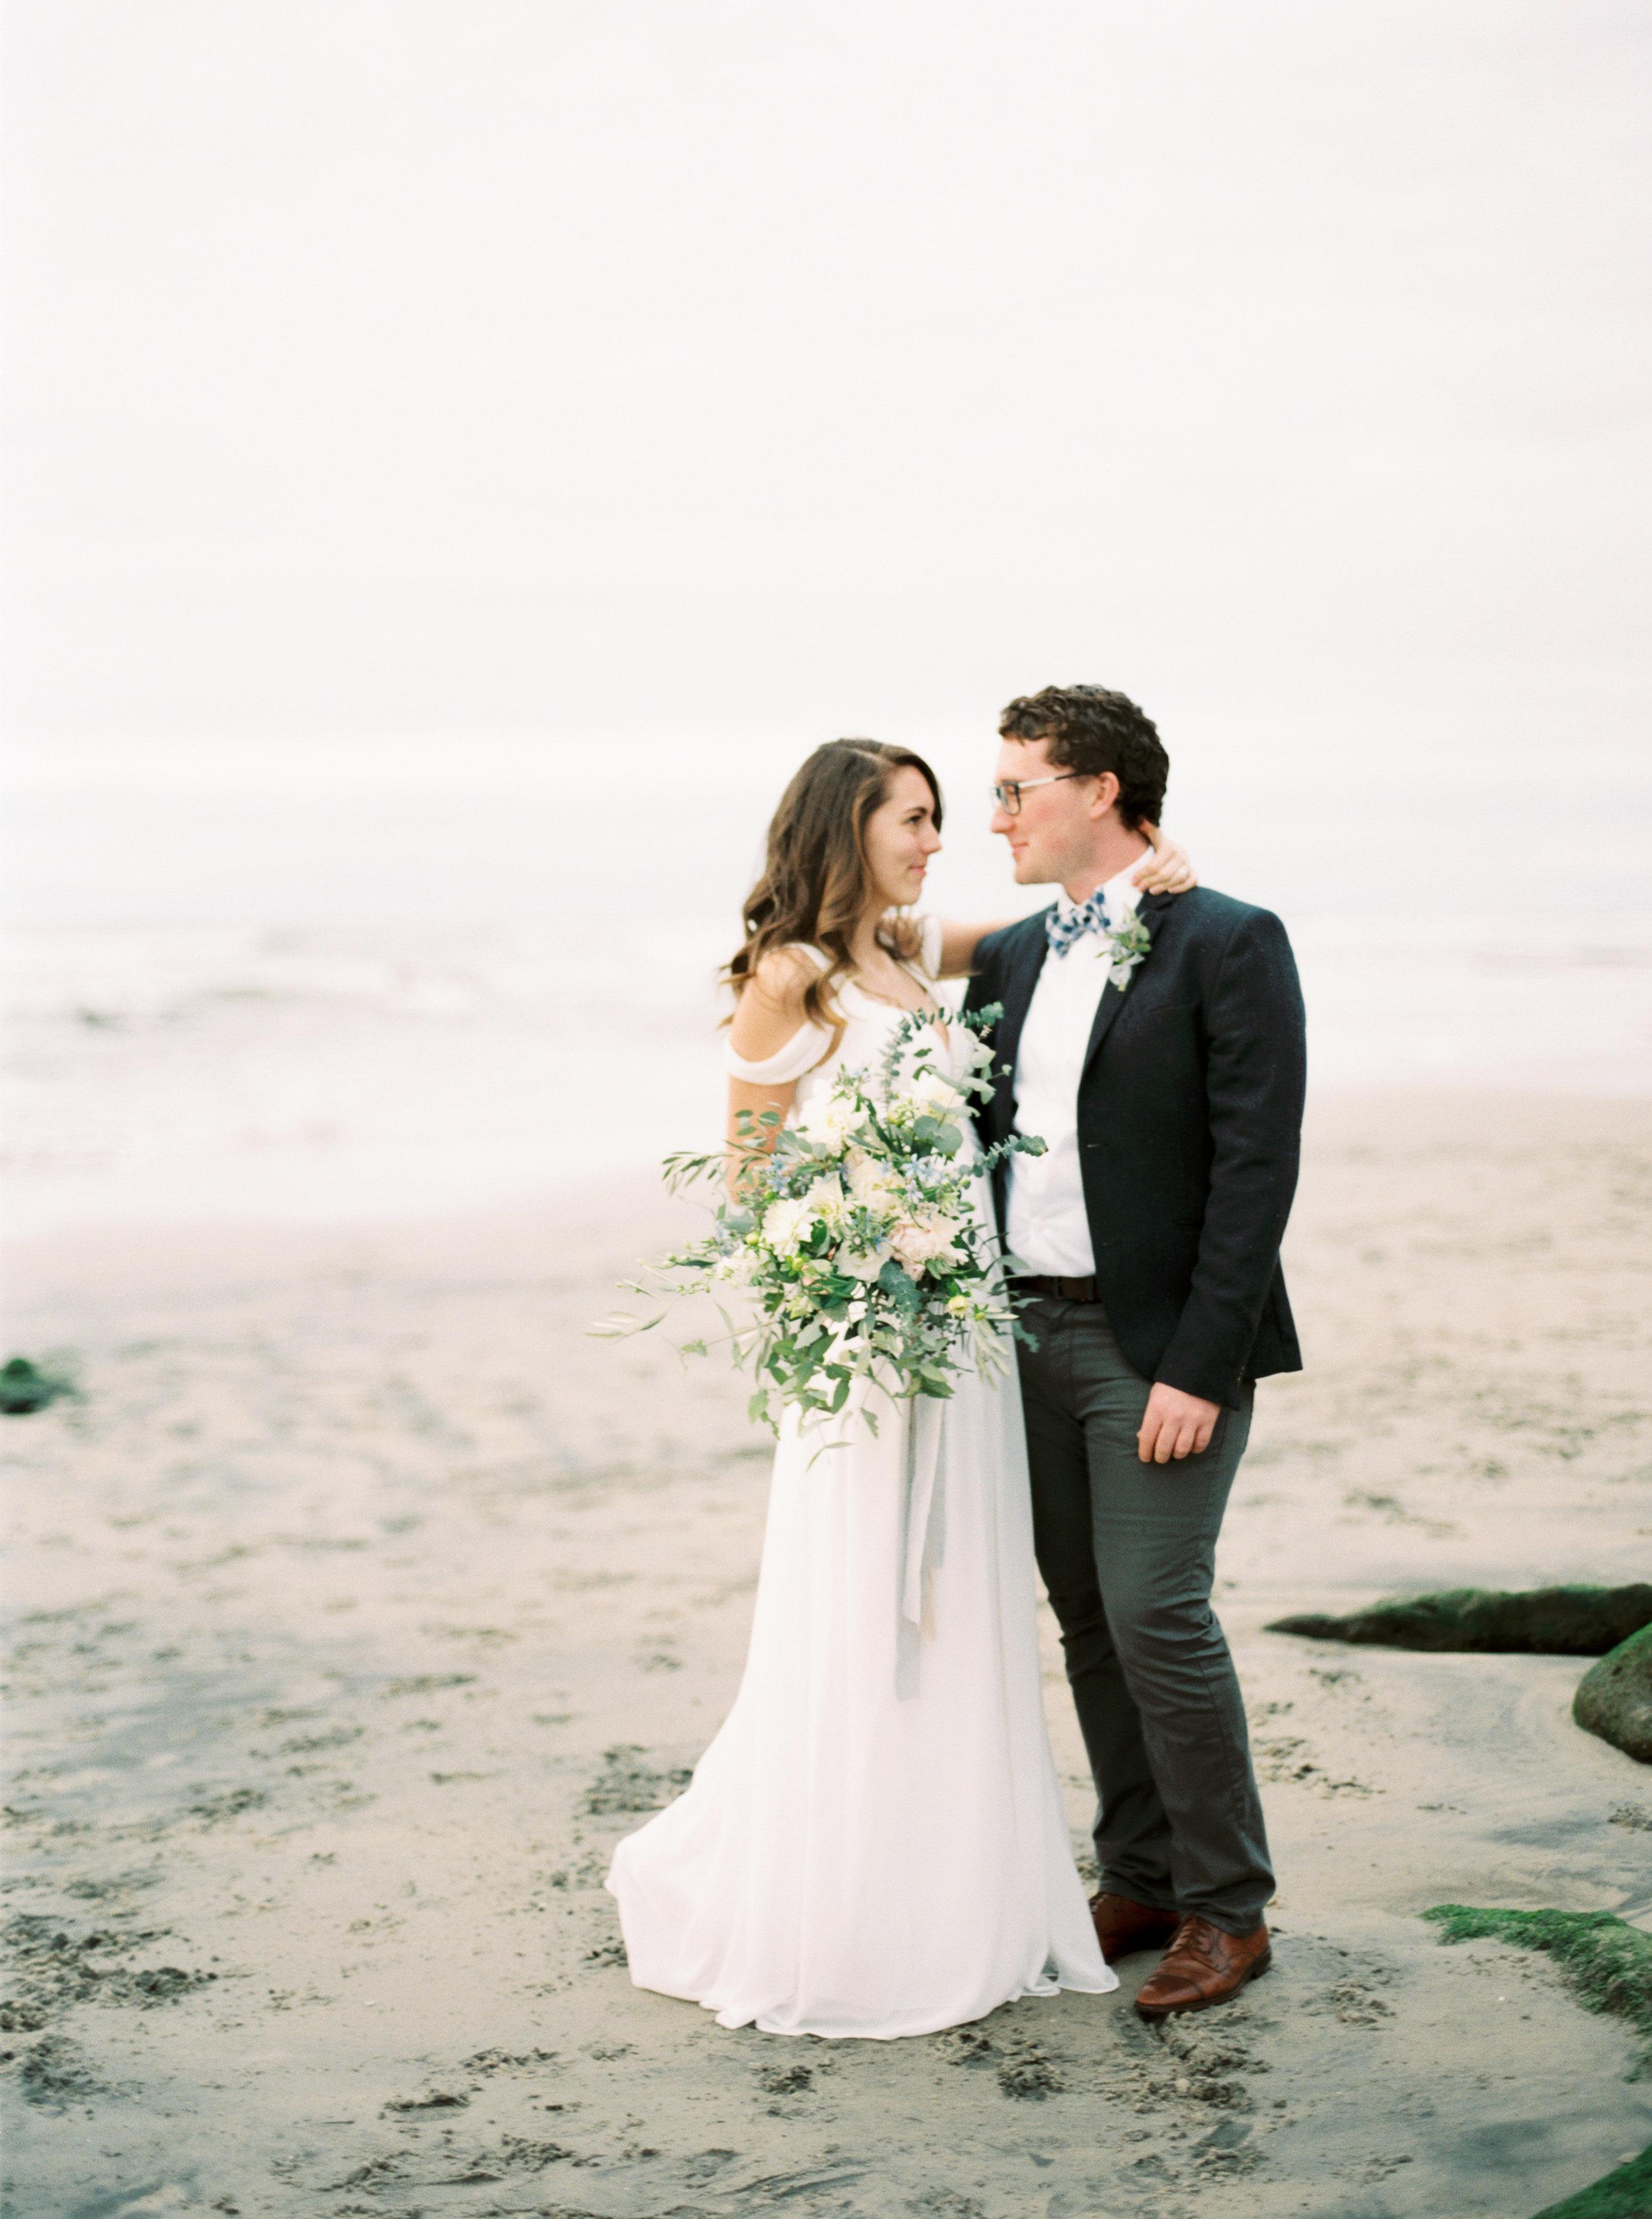 California_Wedding_Photography_Film_FallenPhotograhpy-50.jpg